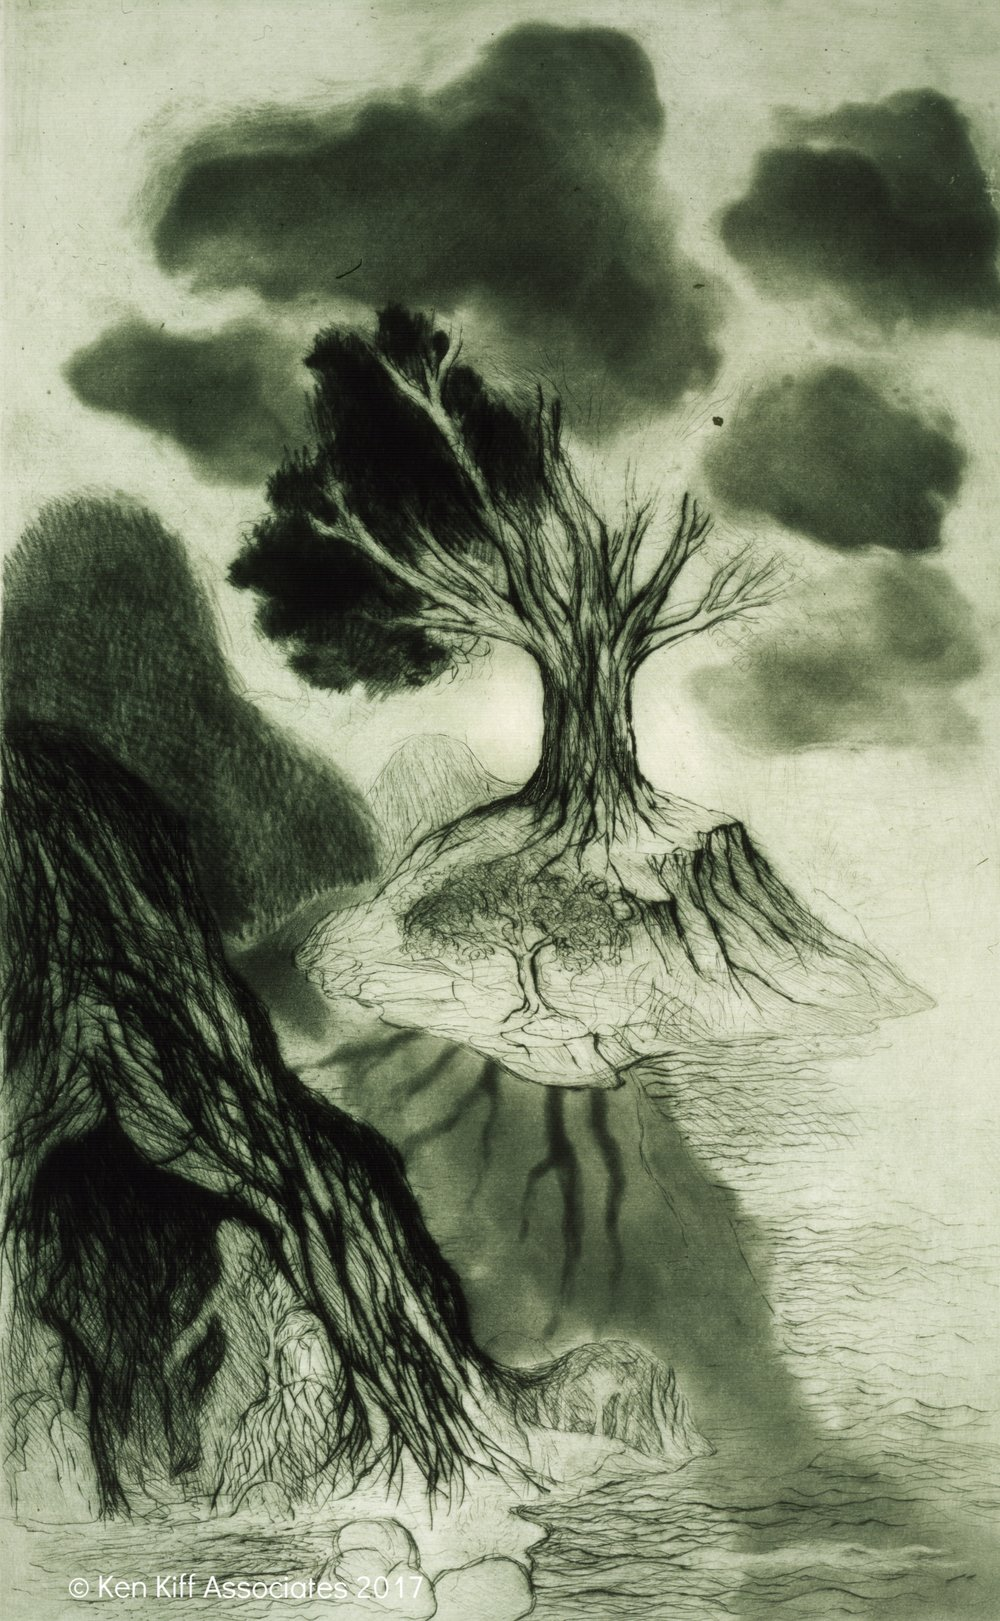 Ken Kiff - The Large Tree